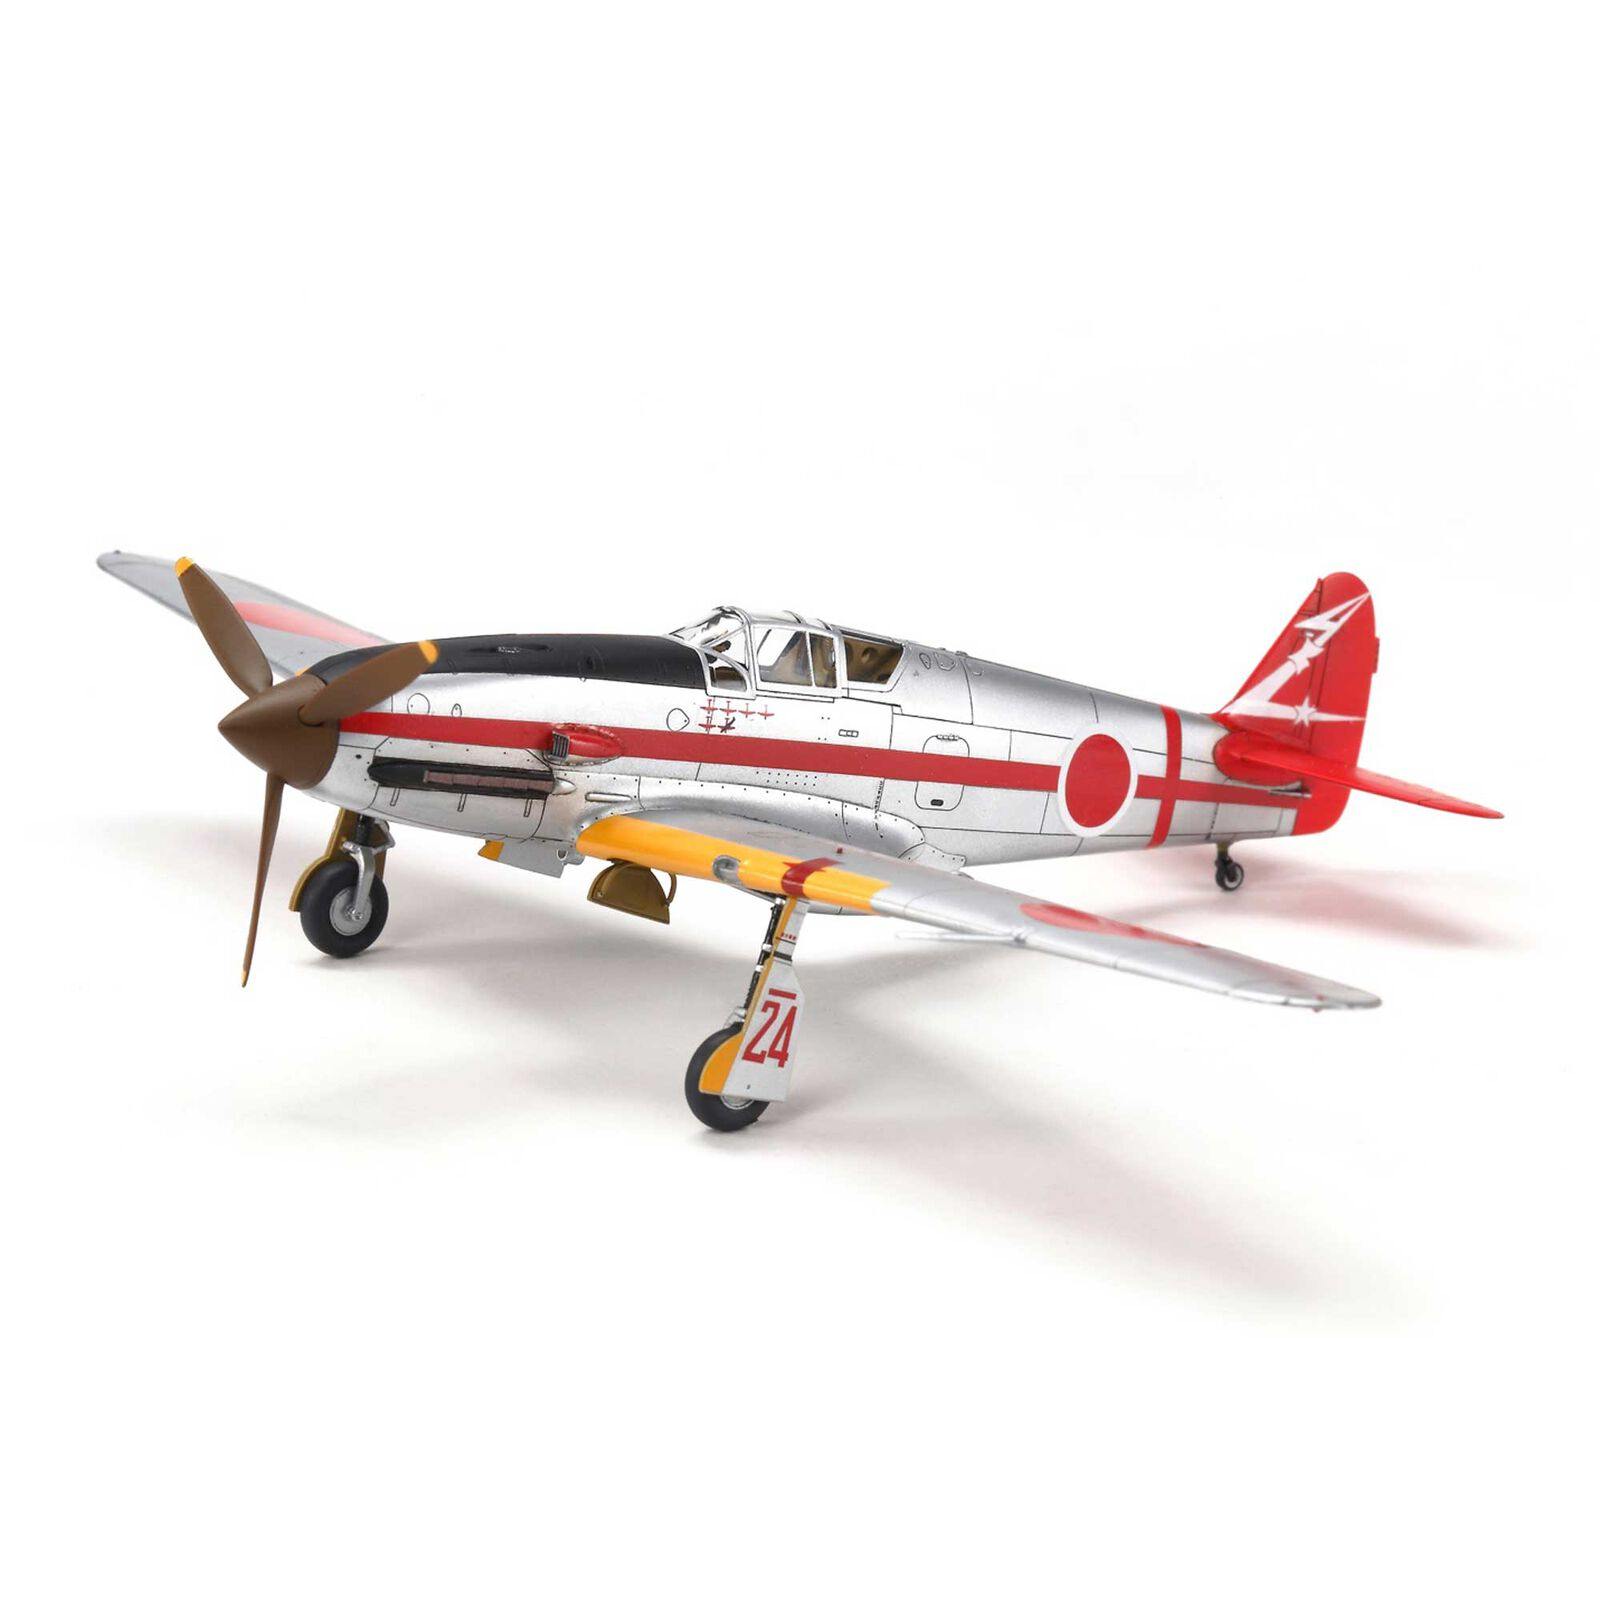 1/72 Kawasaki Ki-61-Id Hien (Tony)